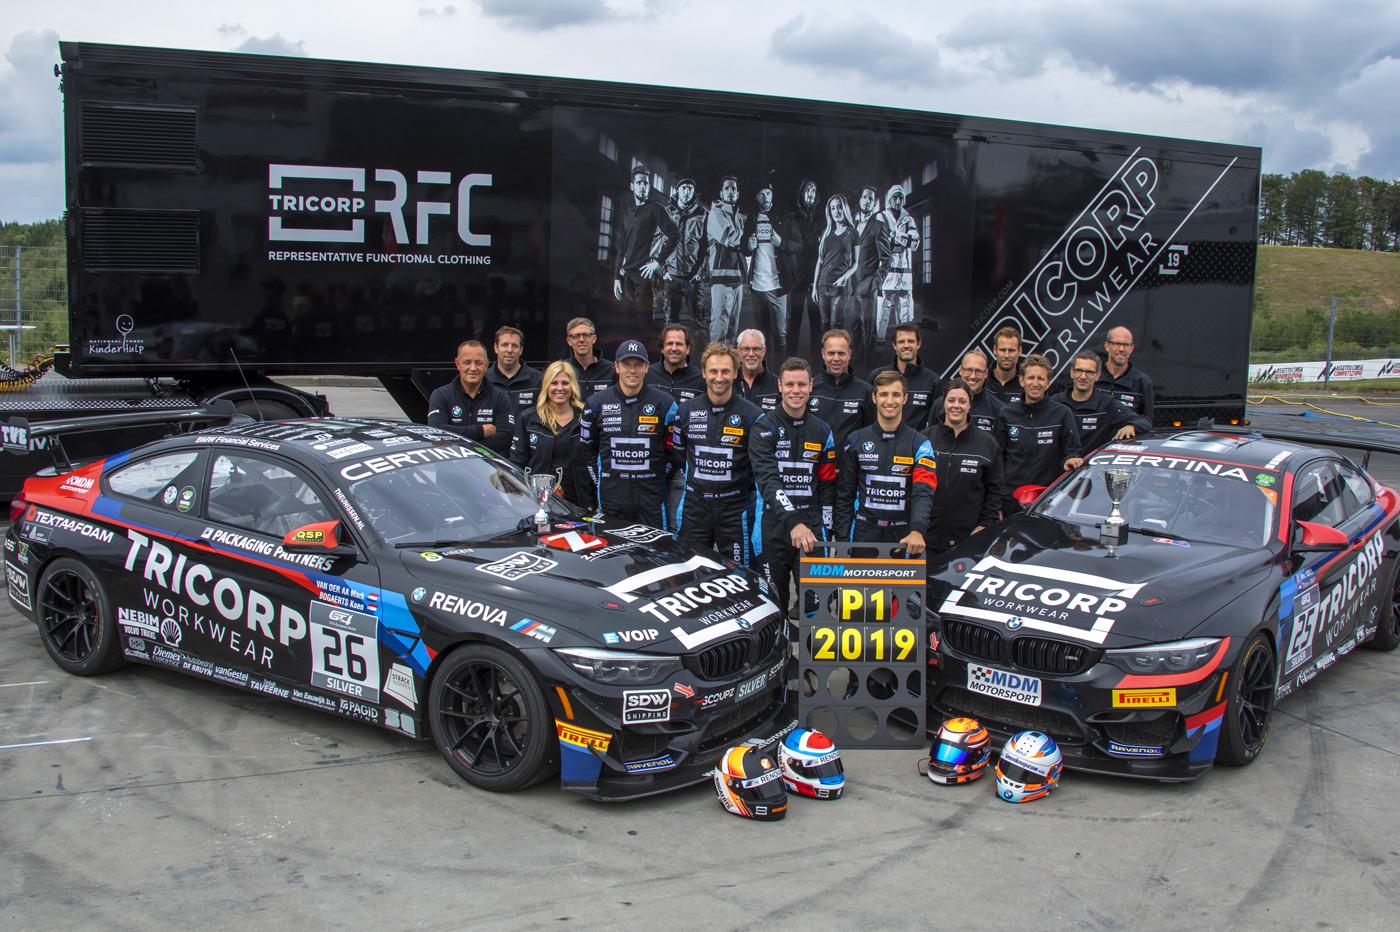 European Champions GT4 Series